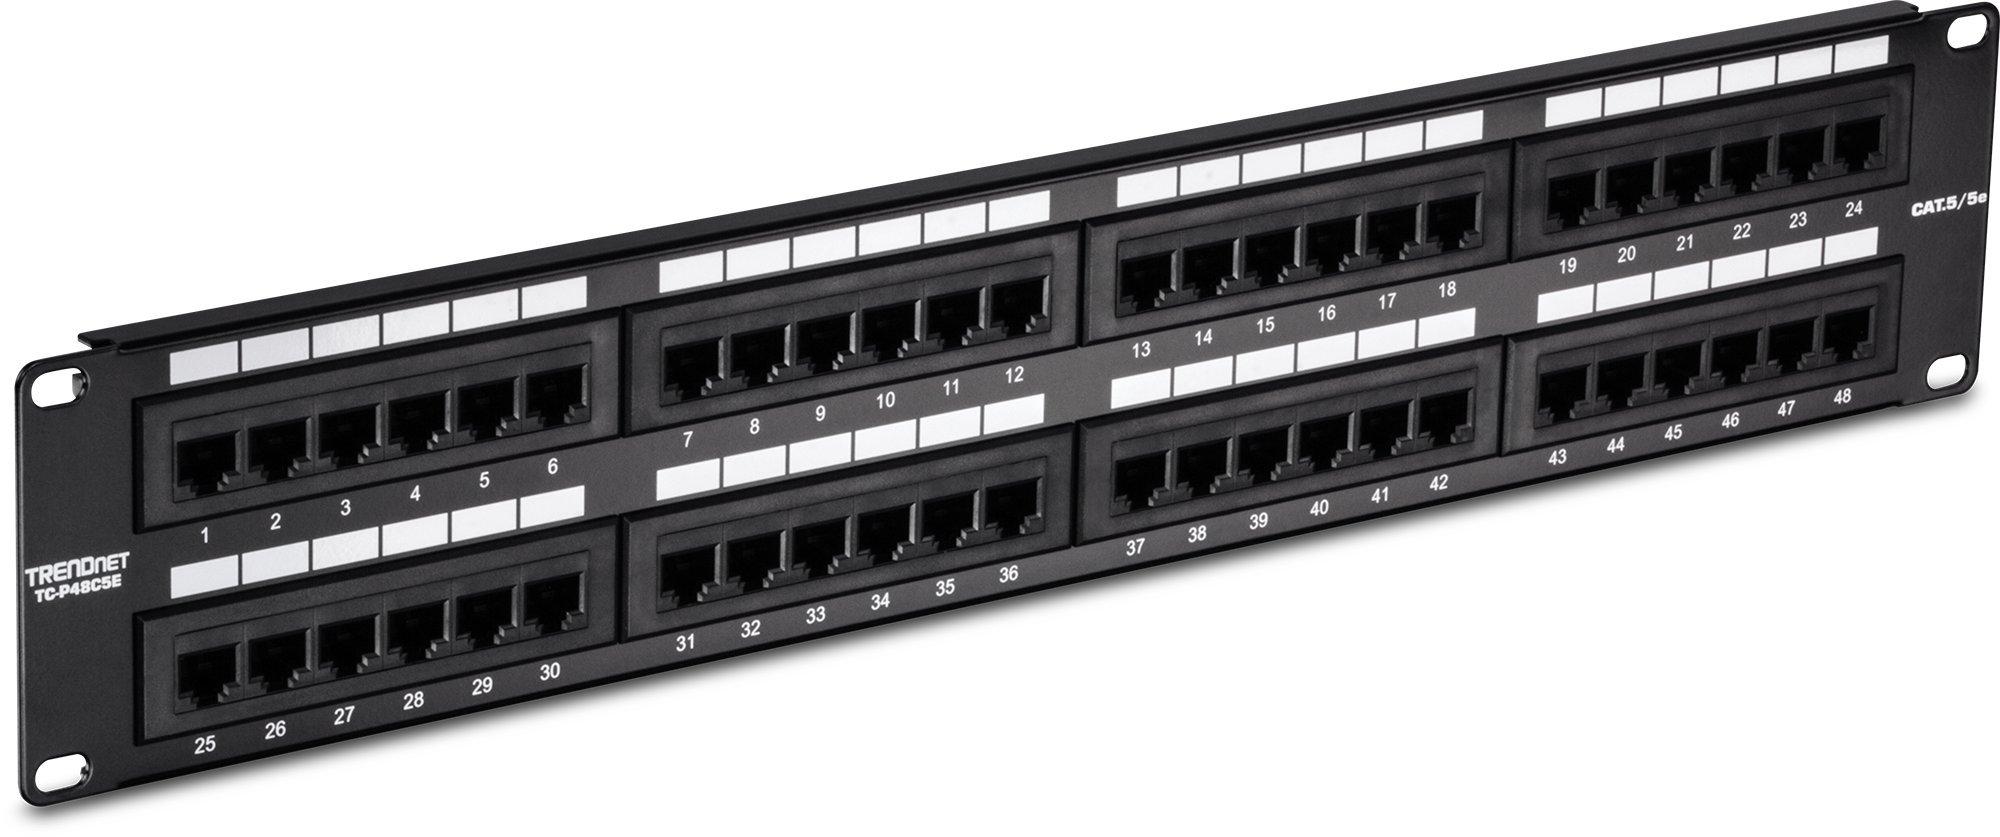 Trendnet 48 Port Cat5 5e Unshielded Wallmount Or Rackmount Patch Cat 5 Wiring Schemes Panel Backwards Compatible